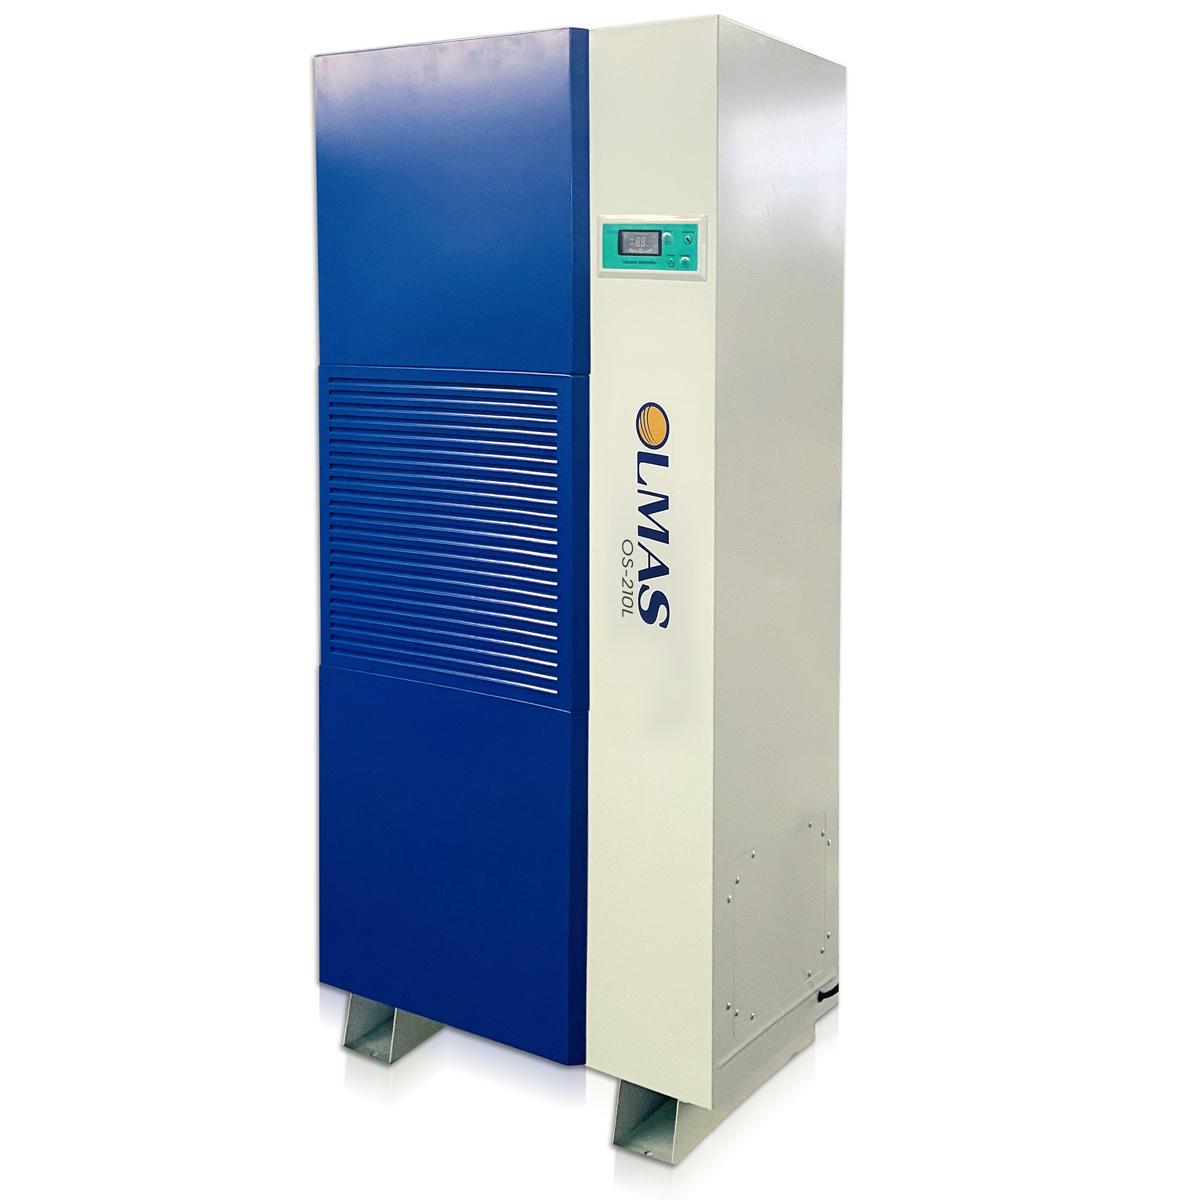 Máy hút ẩm Olmas OS-210L